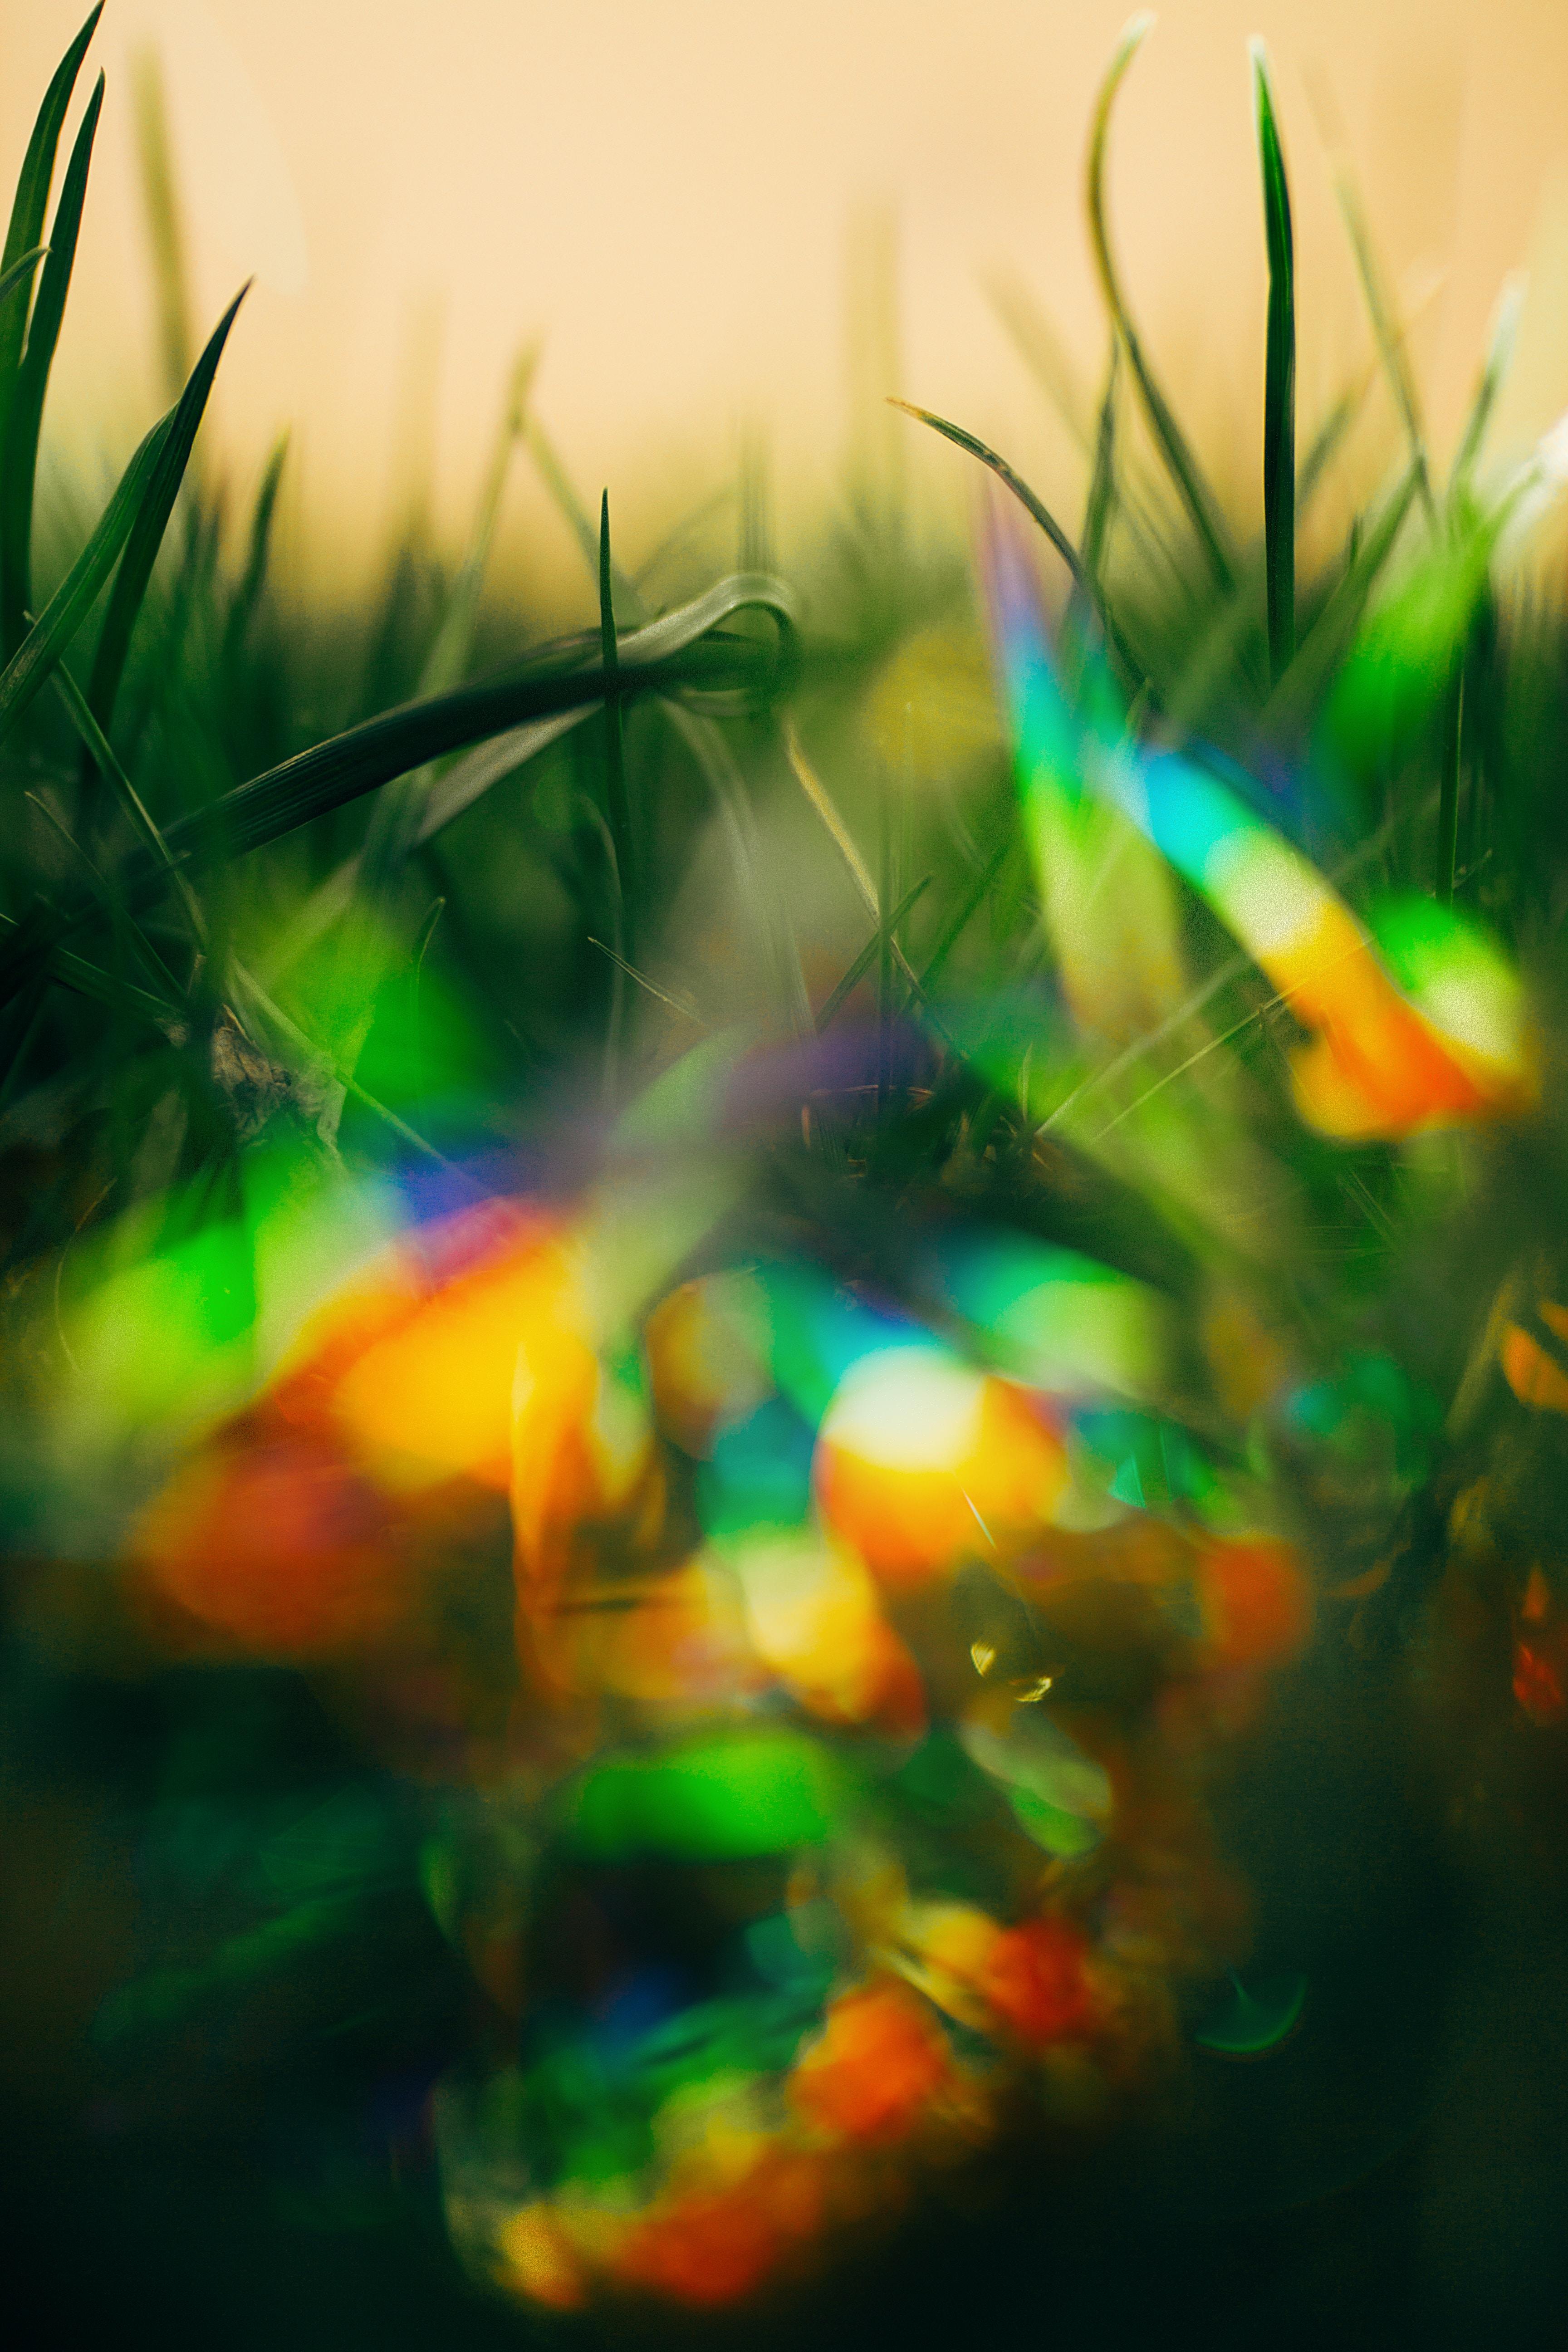 bokeh photography of green grass